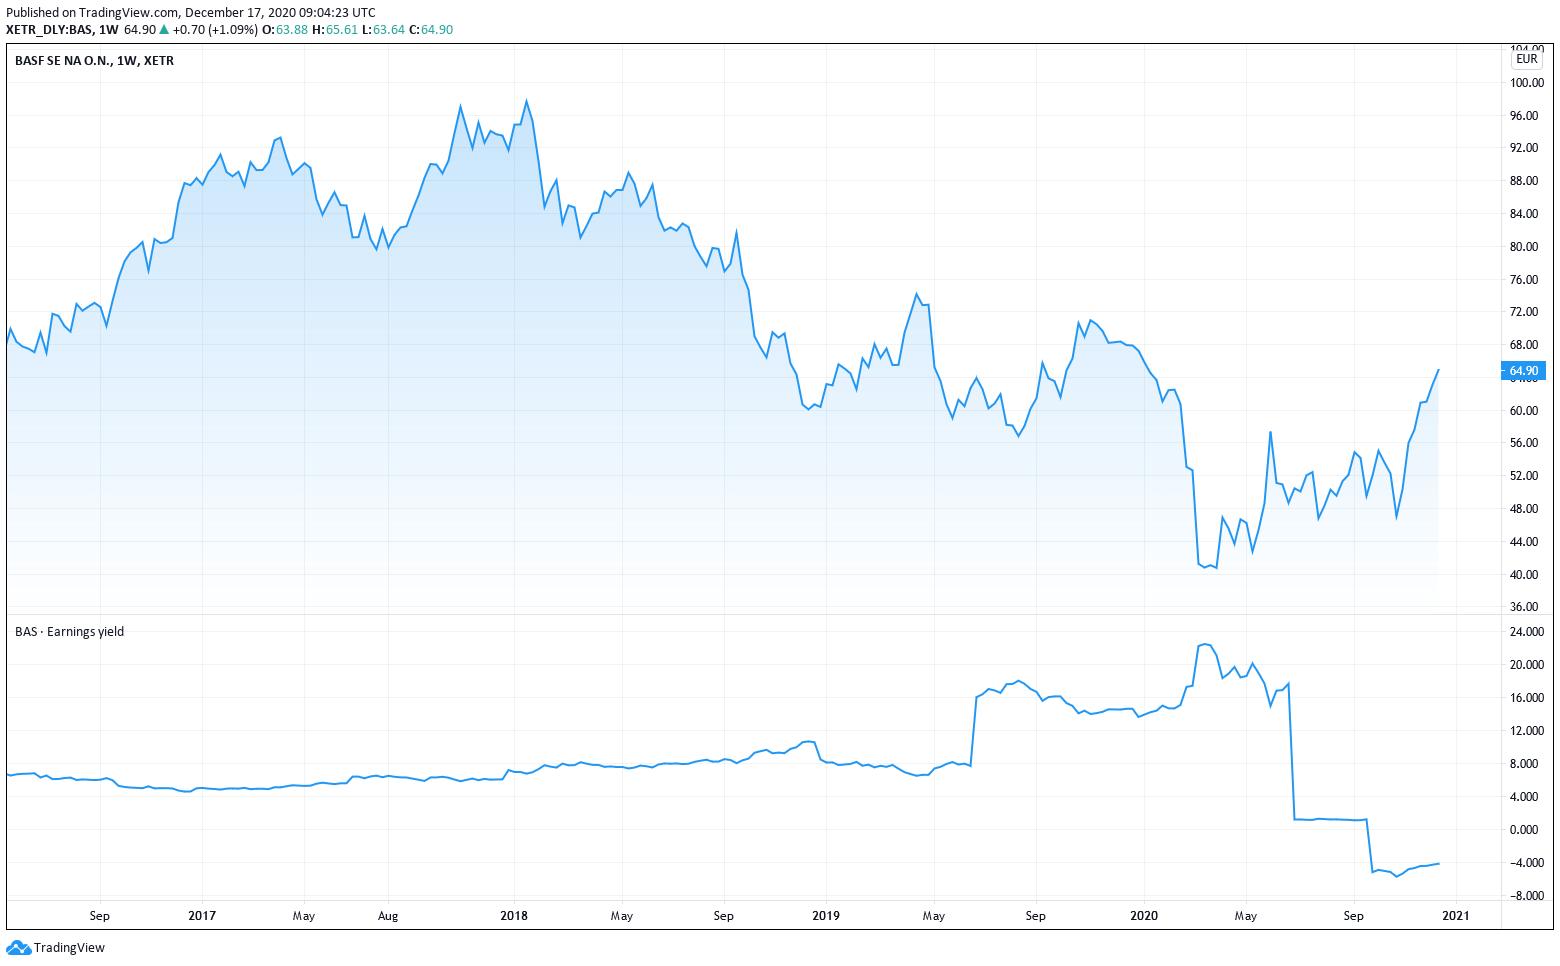 Earnings Yield vs. Aktienkurs von BASF im Zeitverlauf